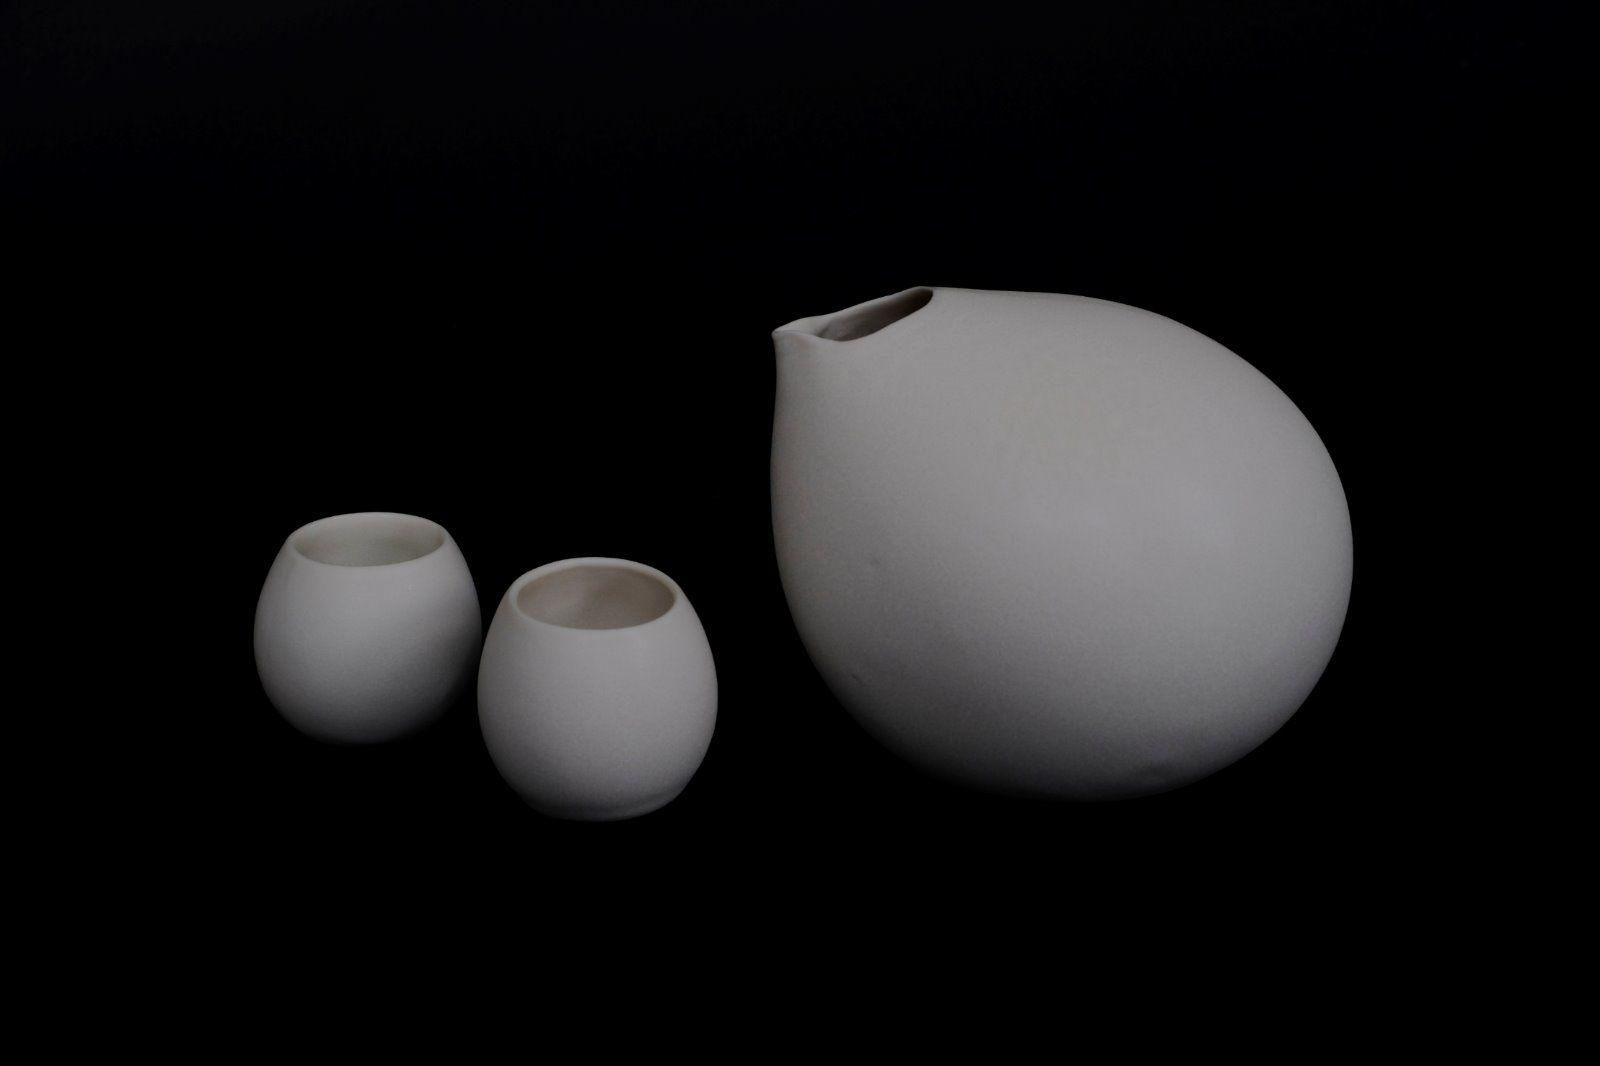 Eggy sake jar and cups